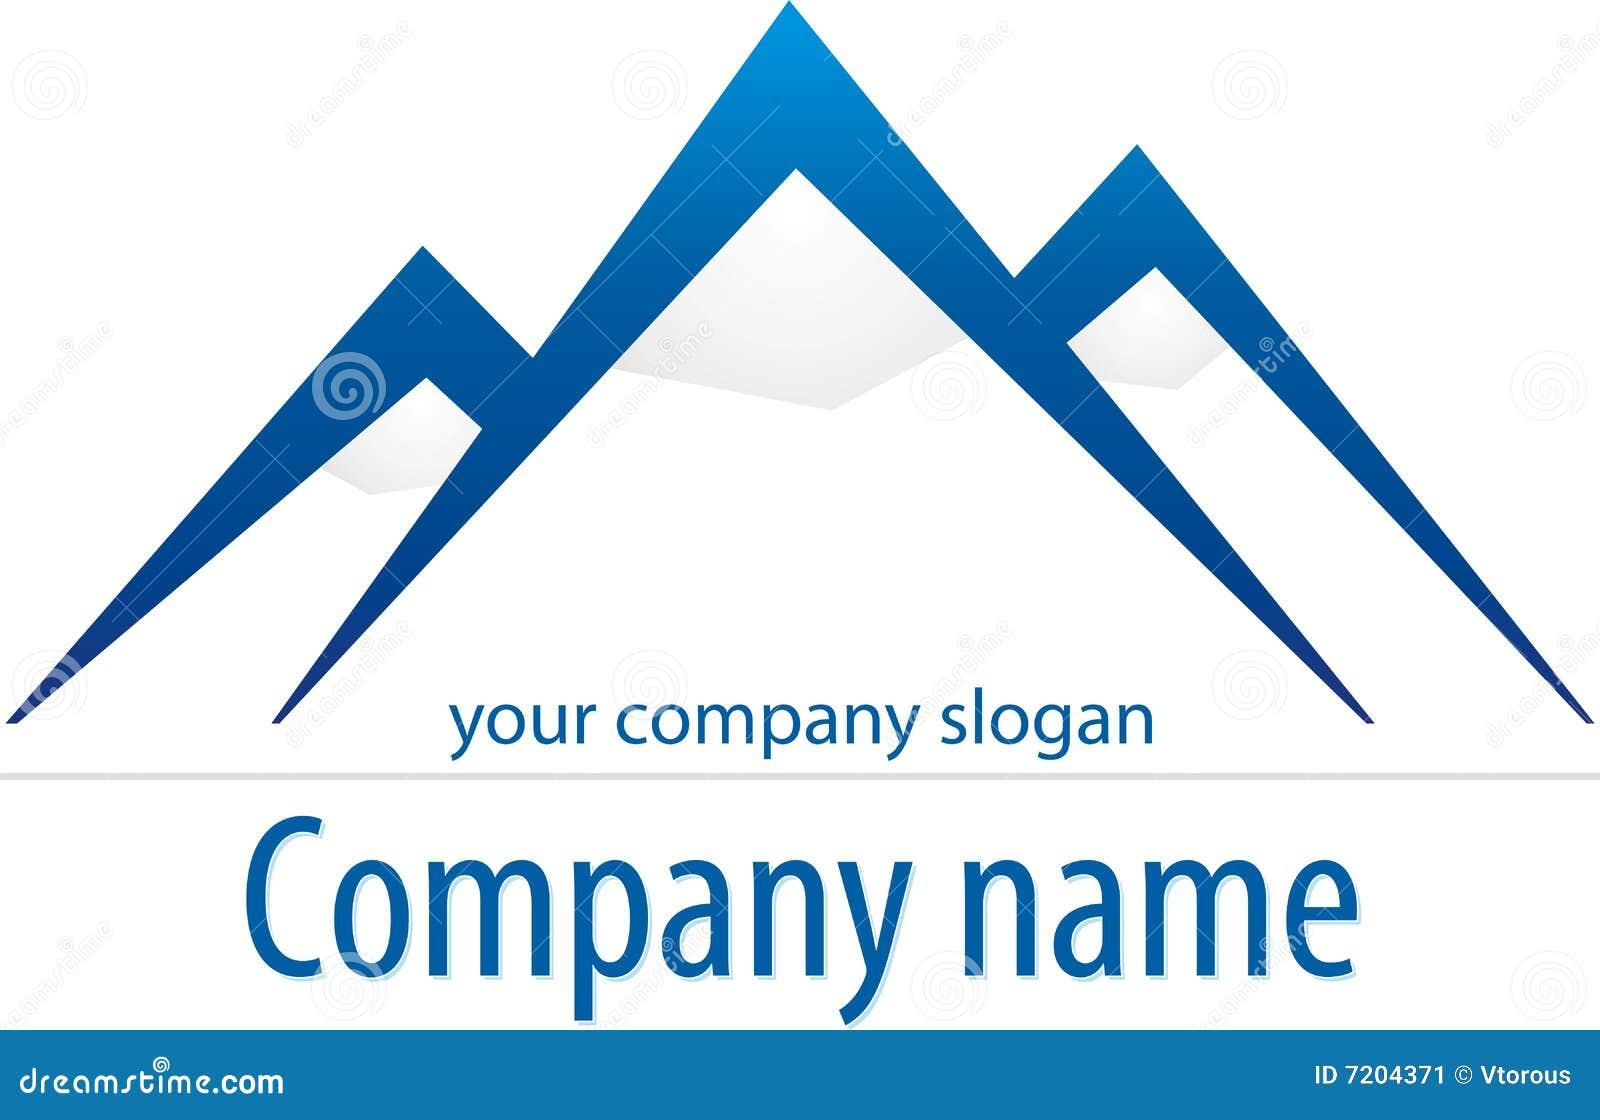 Montana Web Design Company